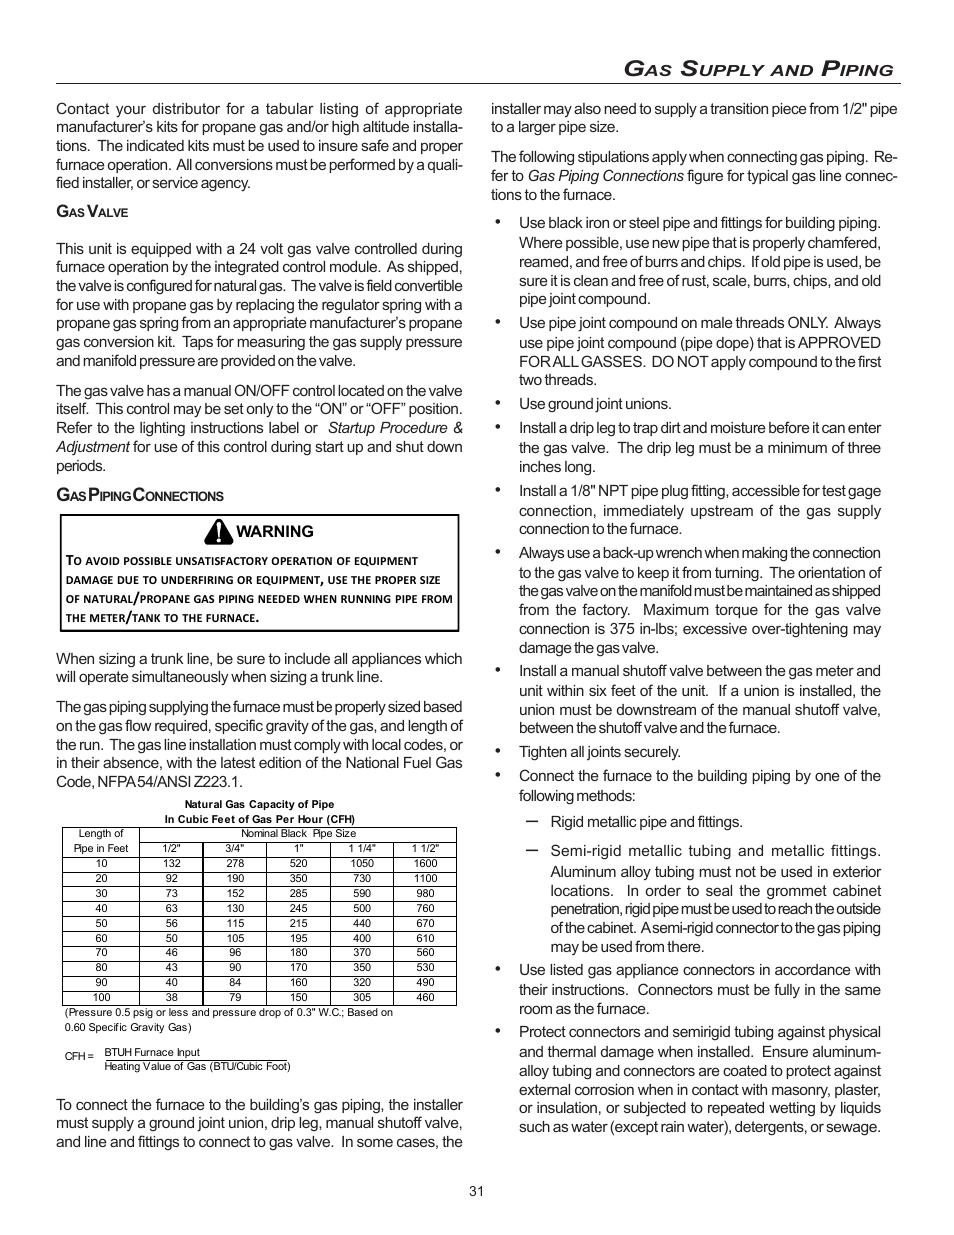 Goodman Mfg MVC95 User Manual | Page 31 / 60